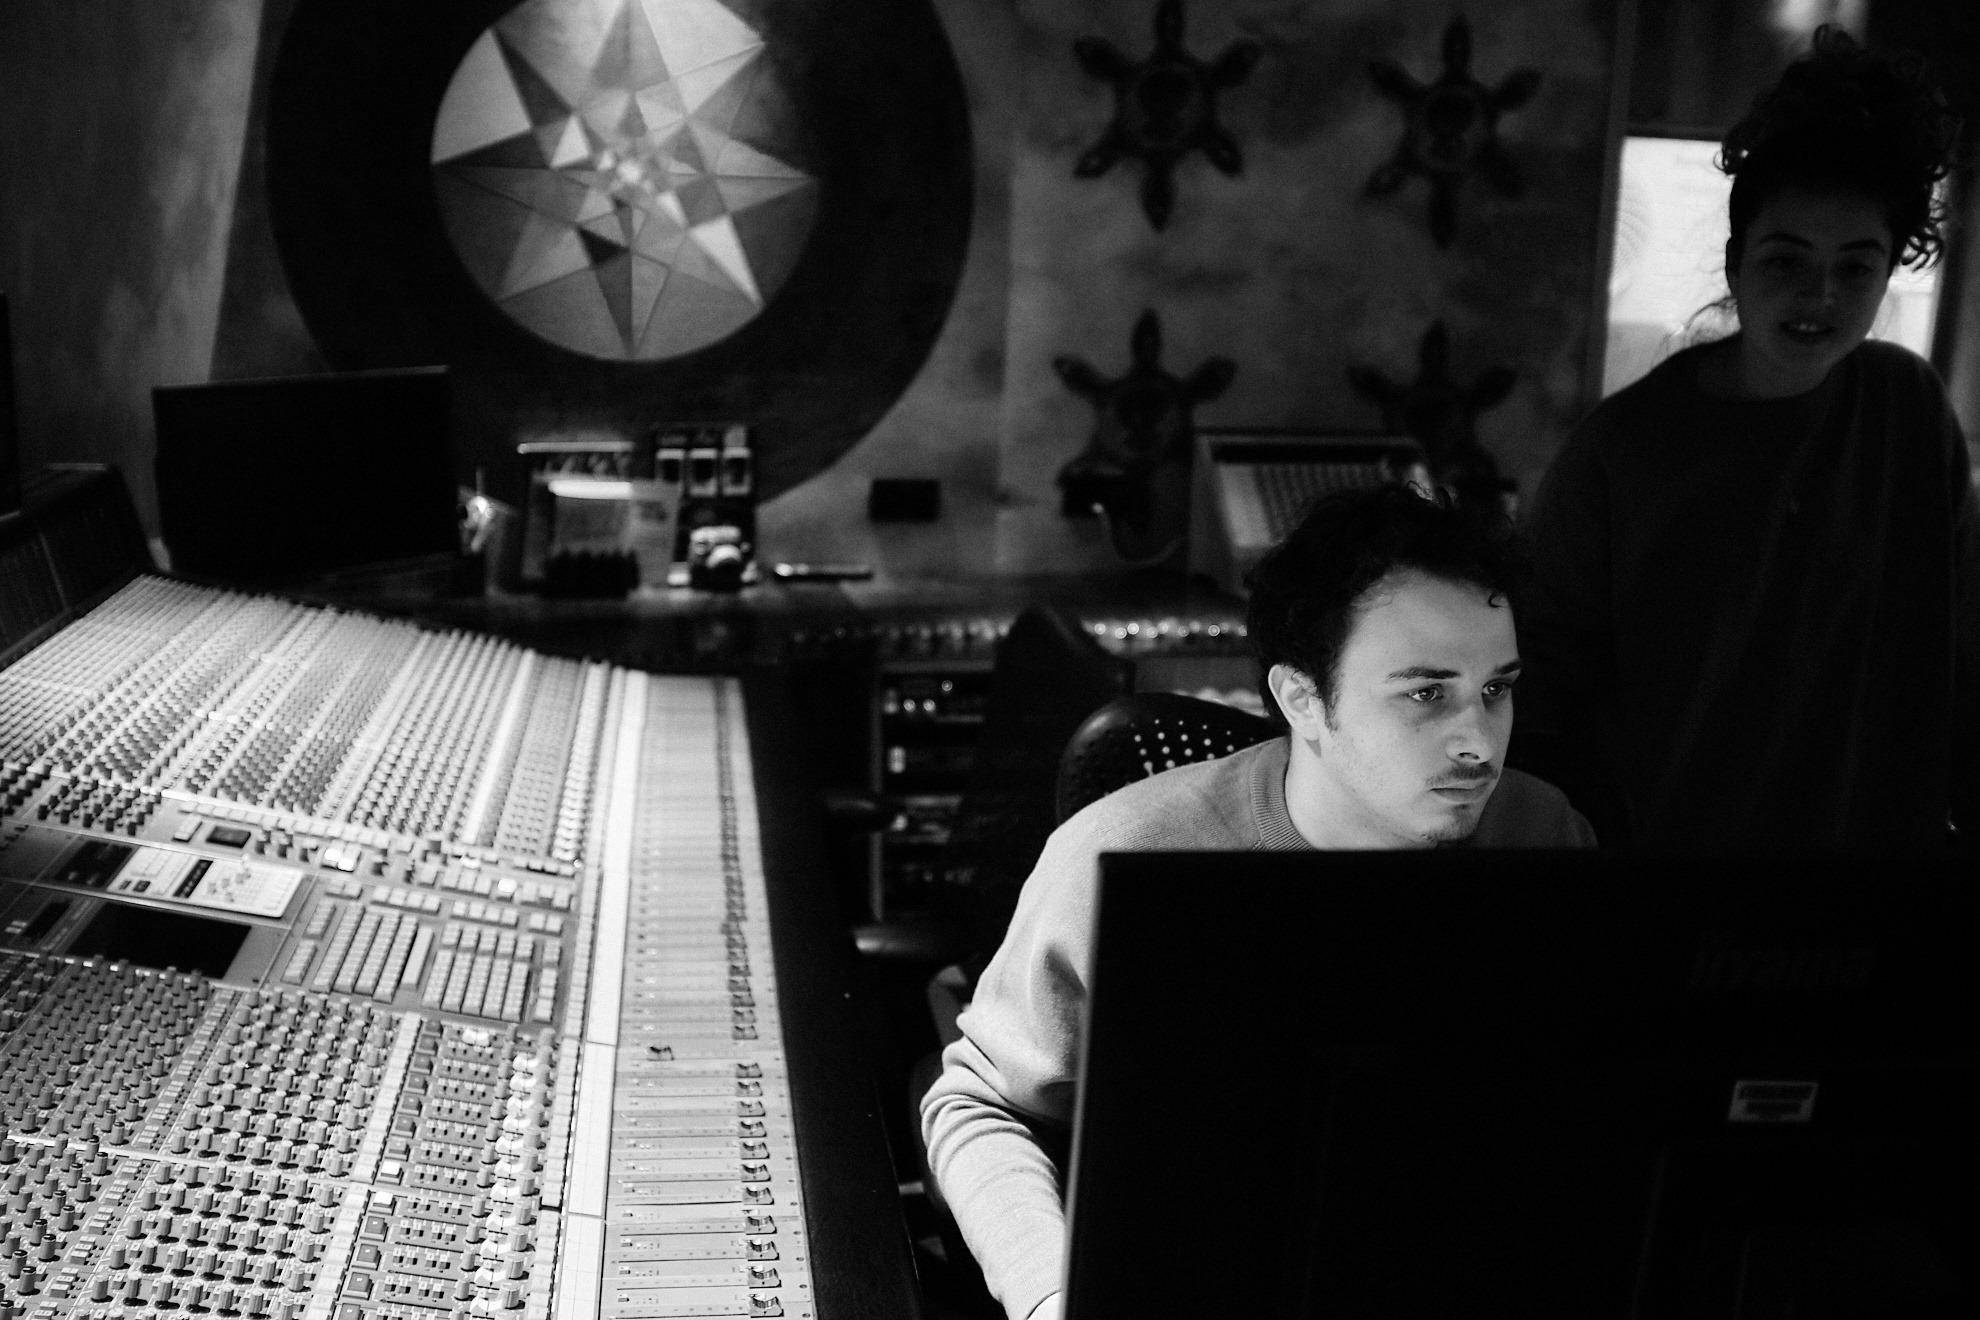 Ricky Damian sitting in the studio